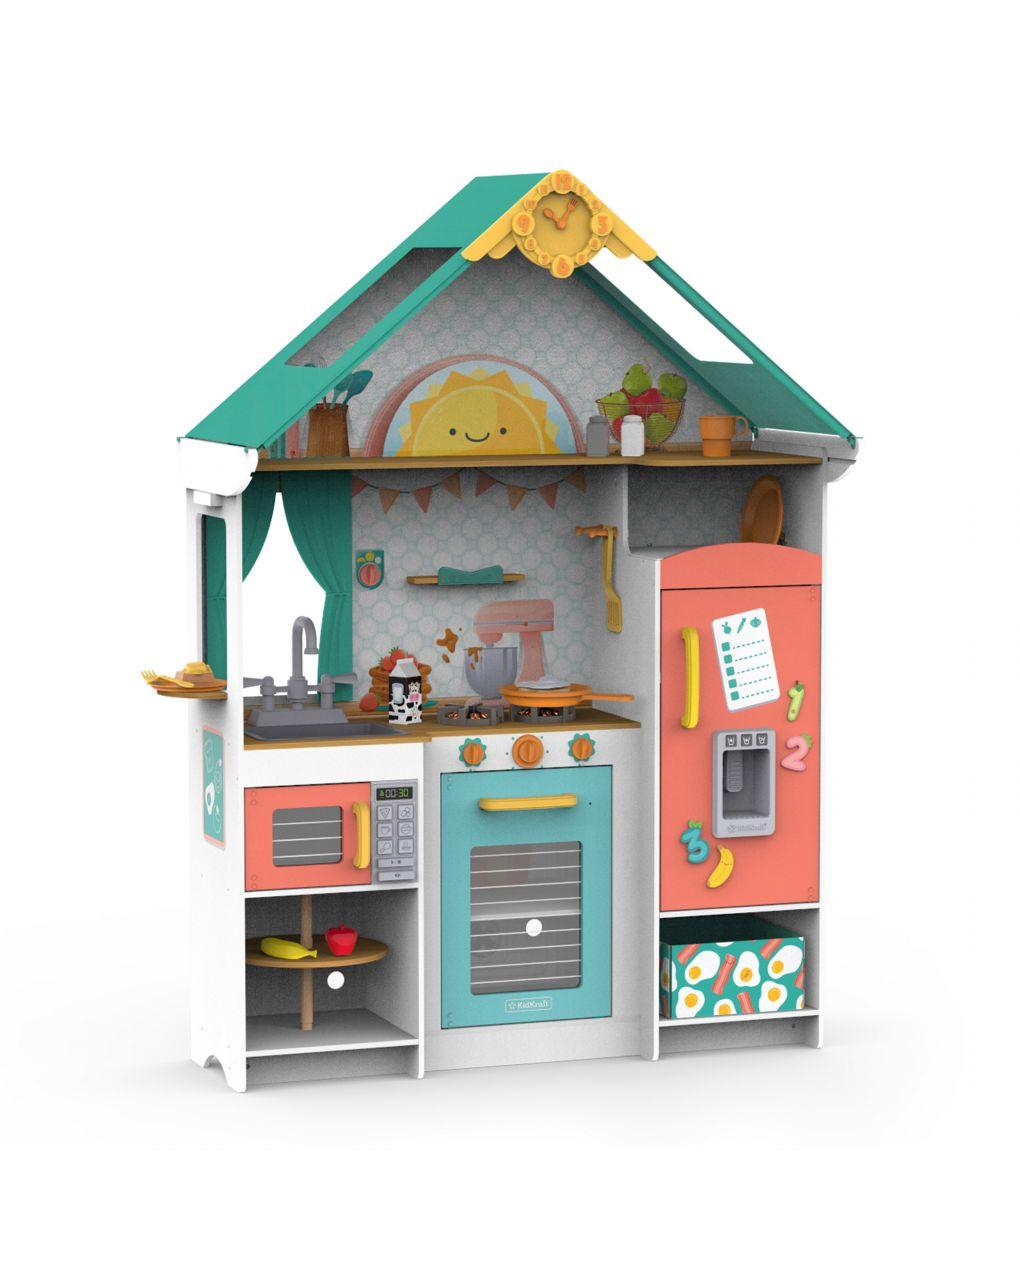 Morning sunshine play kitchen - Kidkraft